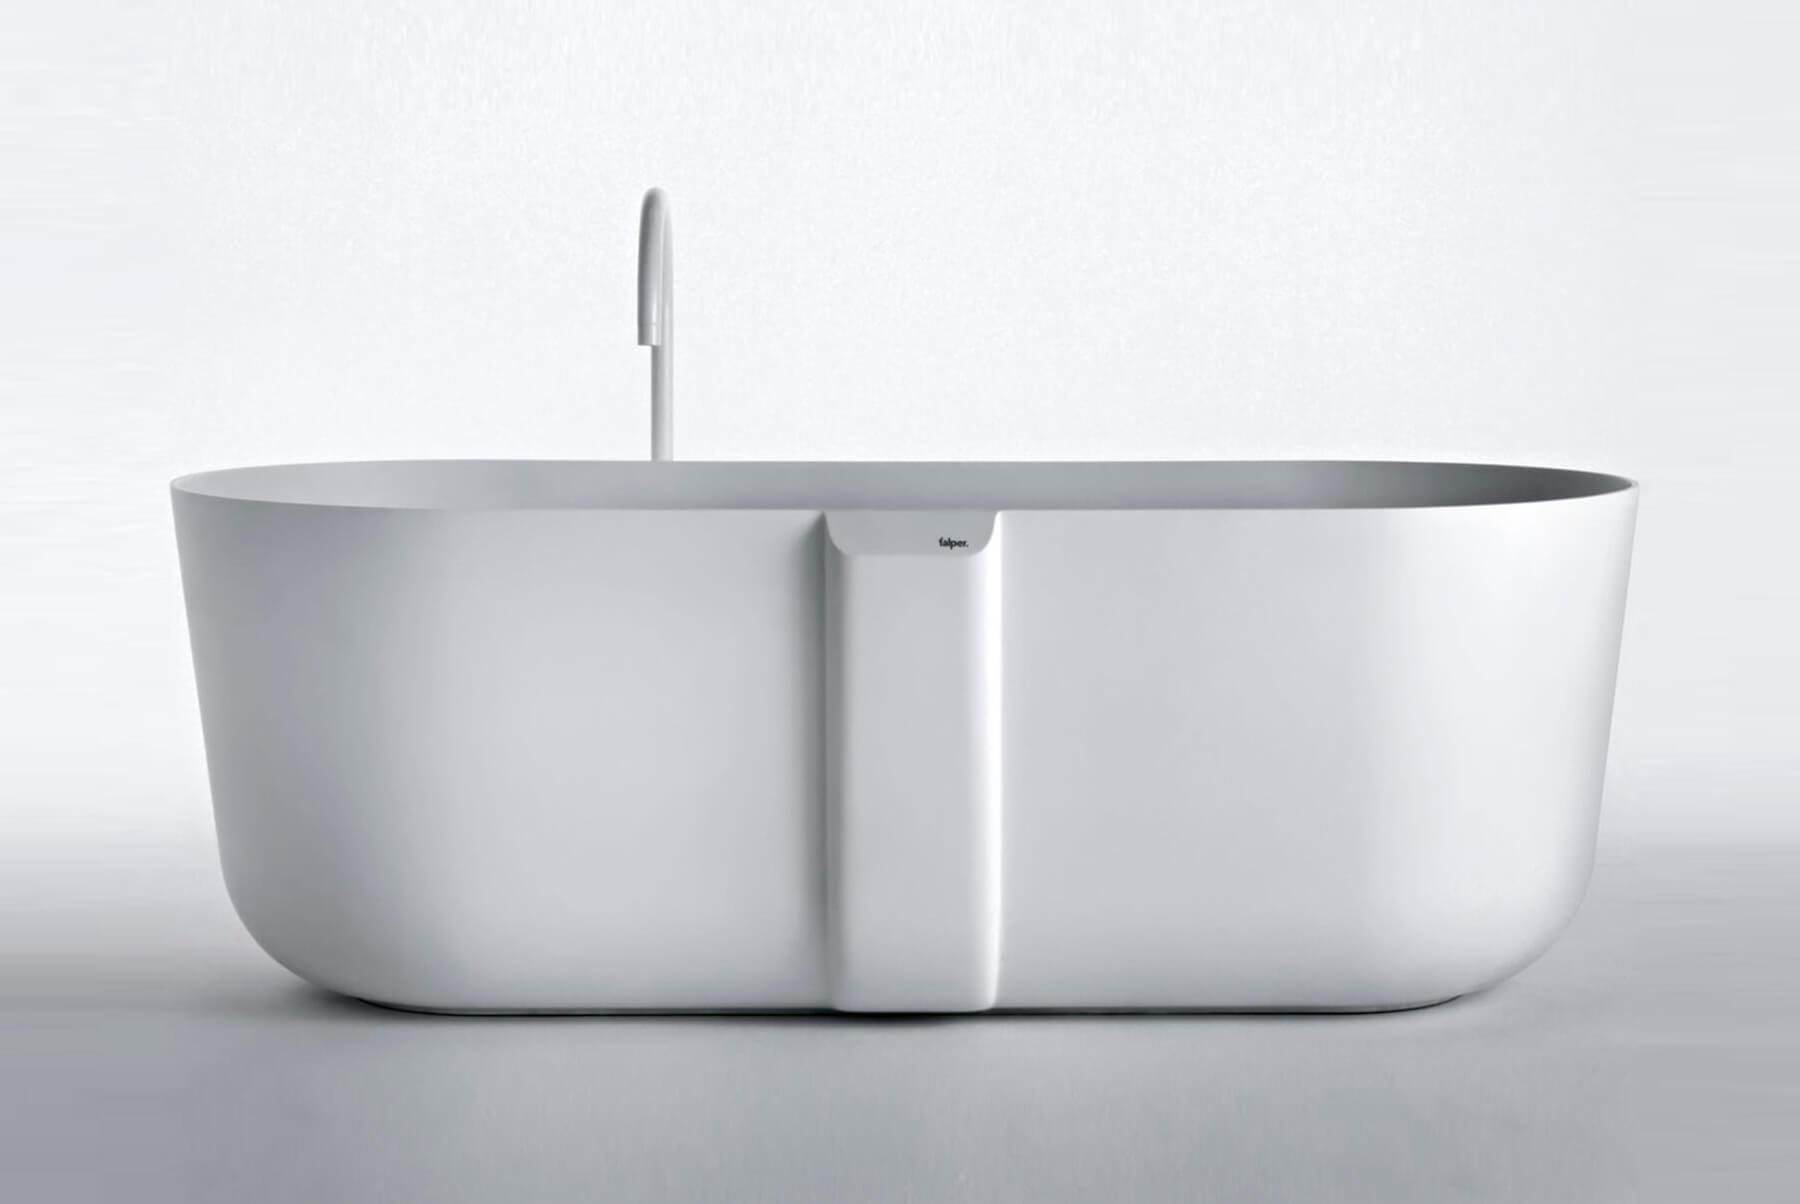 Bath-Tubs-Falper-Quattro-zero-side-1800x1204